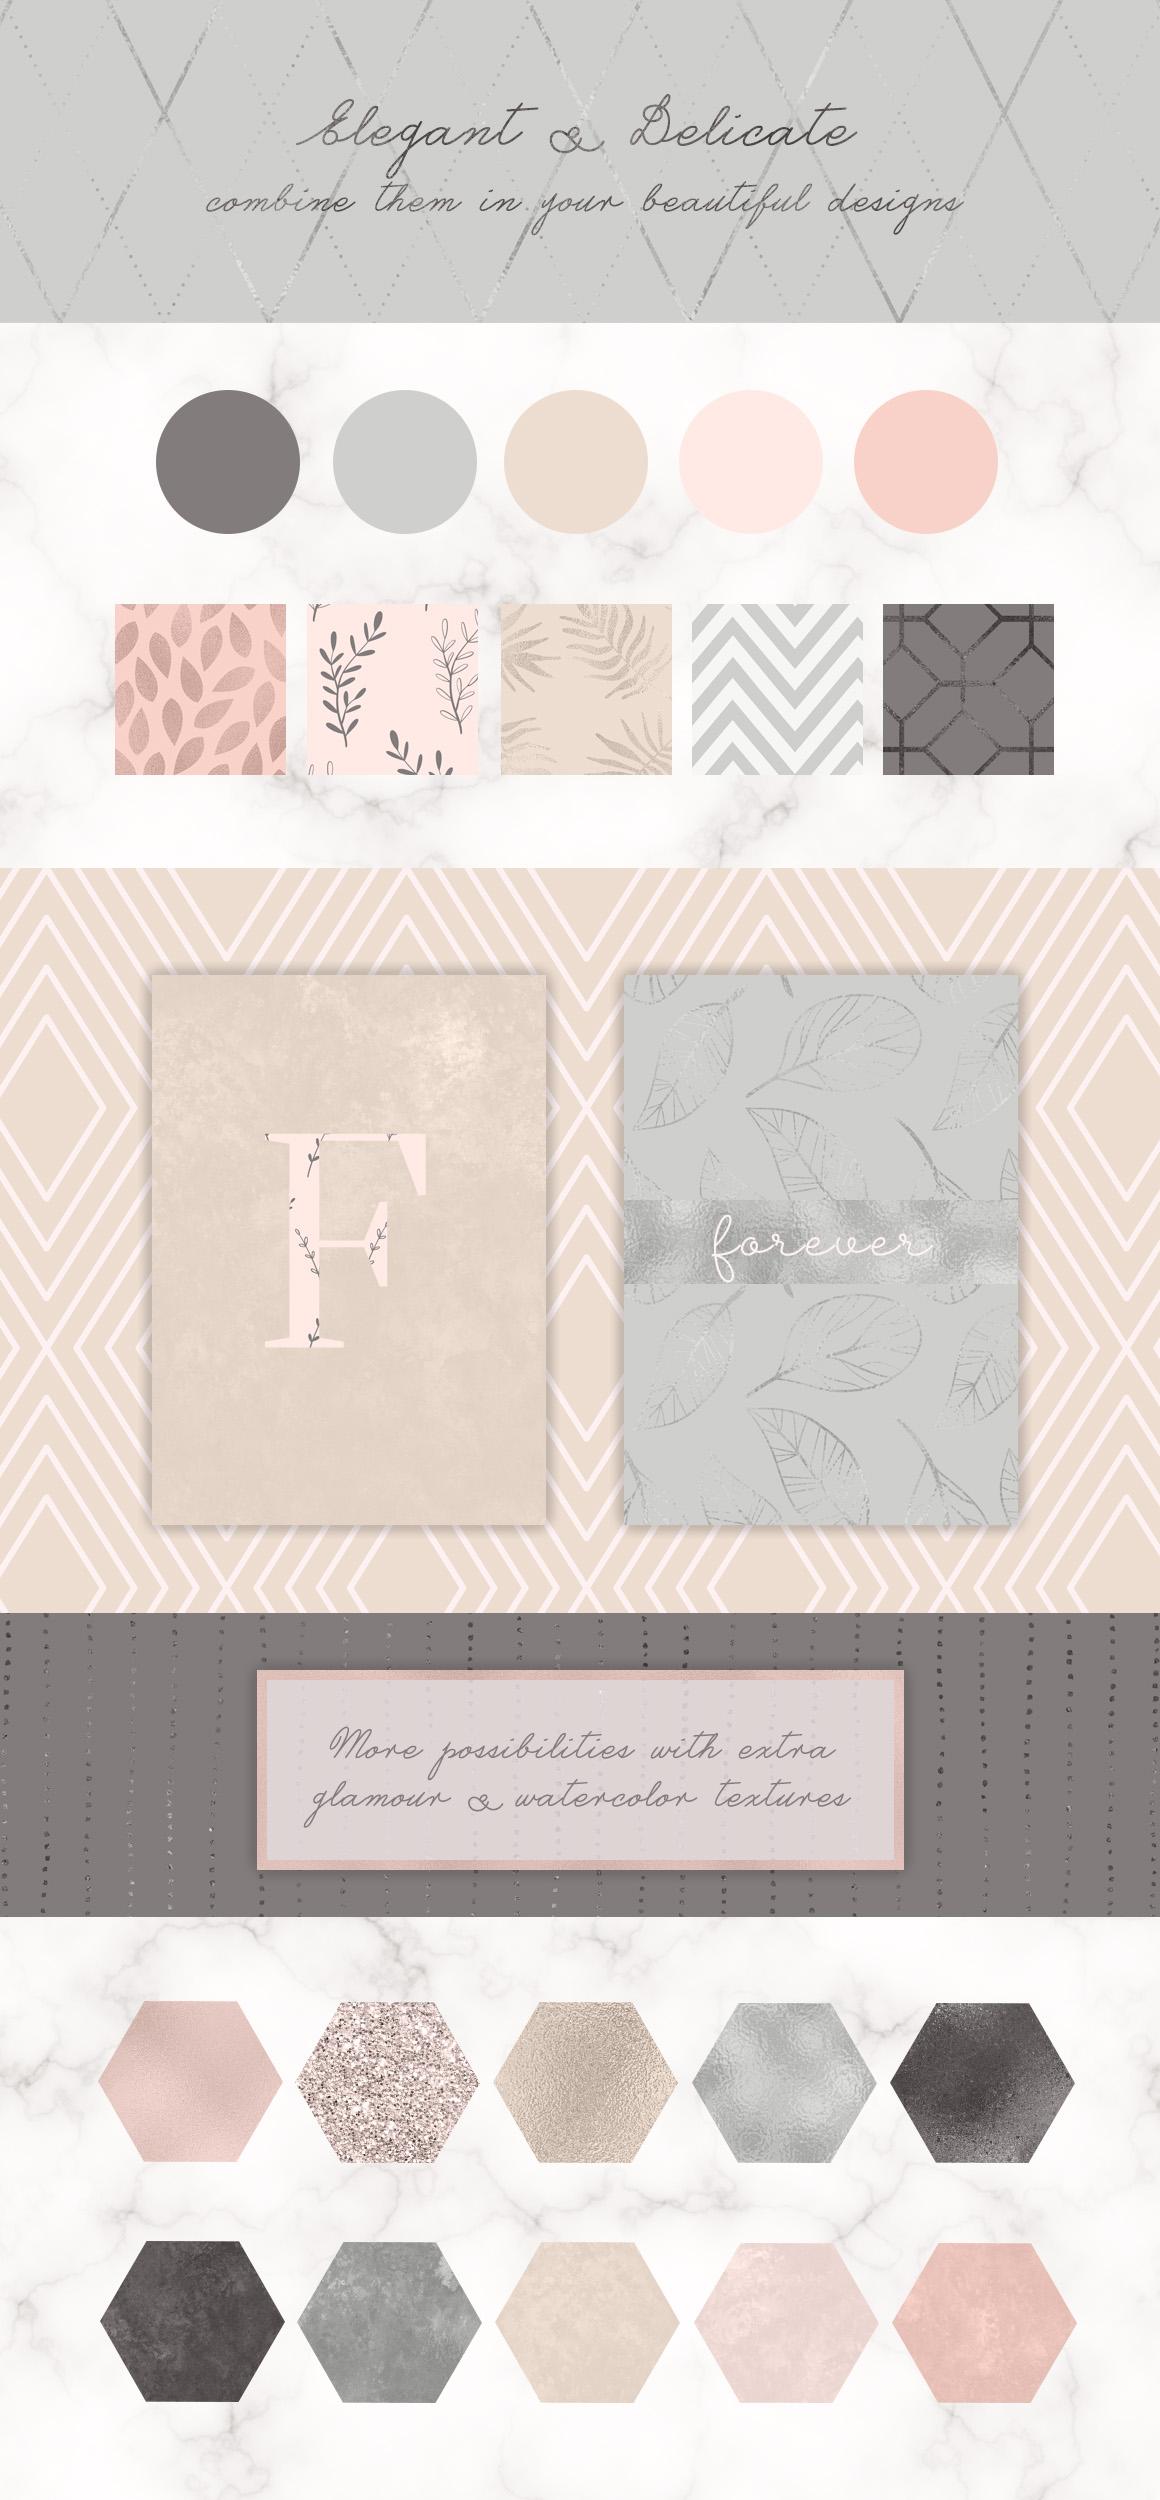 Delicate & Elegant Collection, set II example image 2